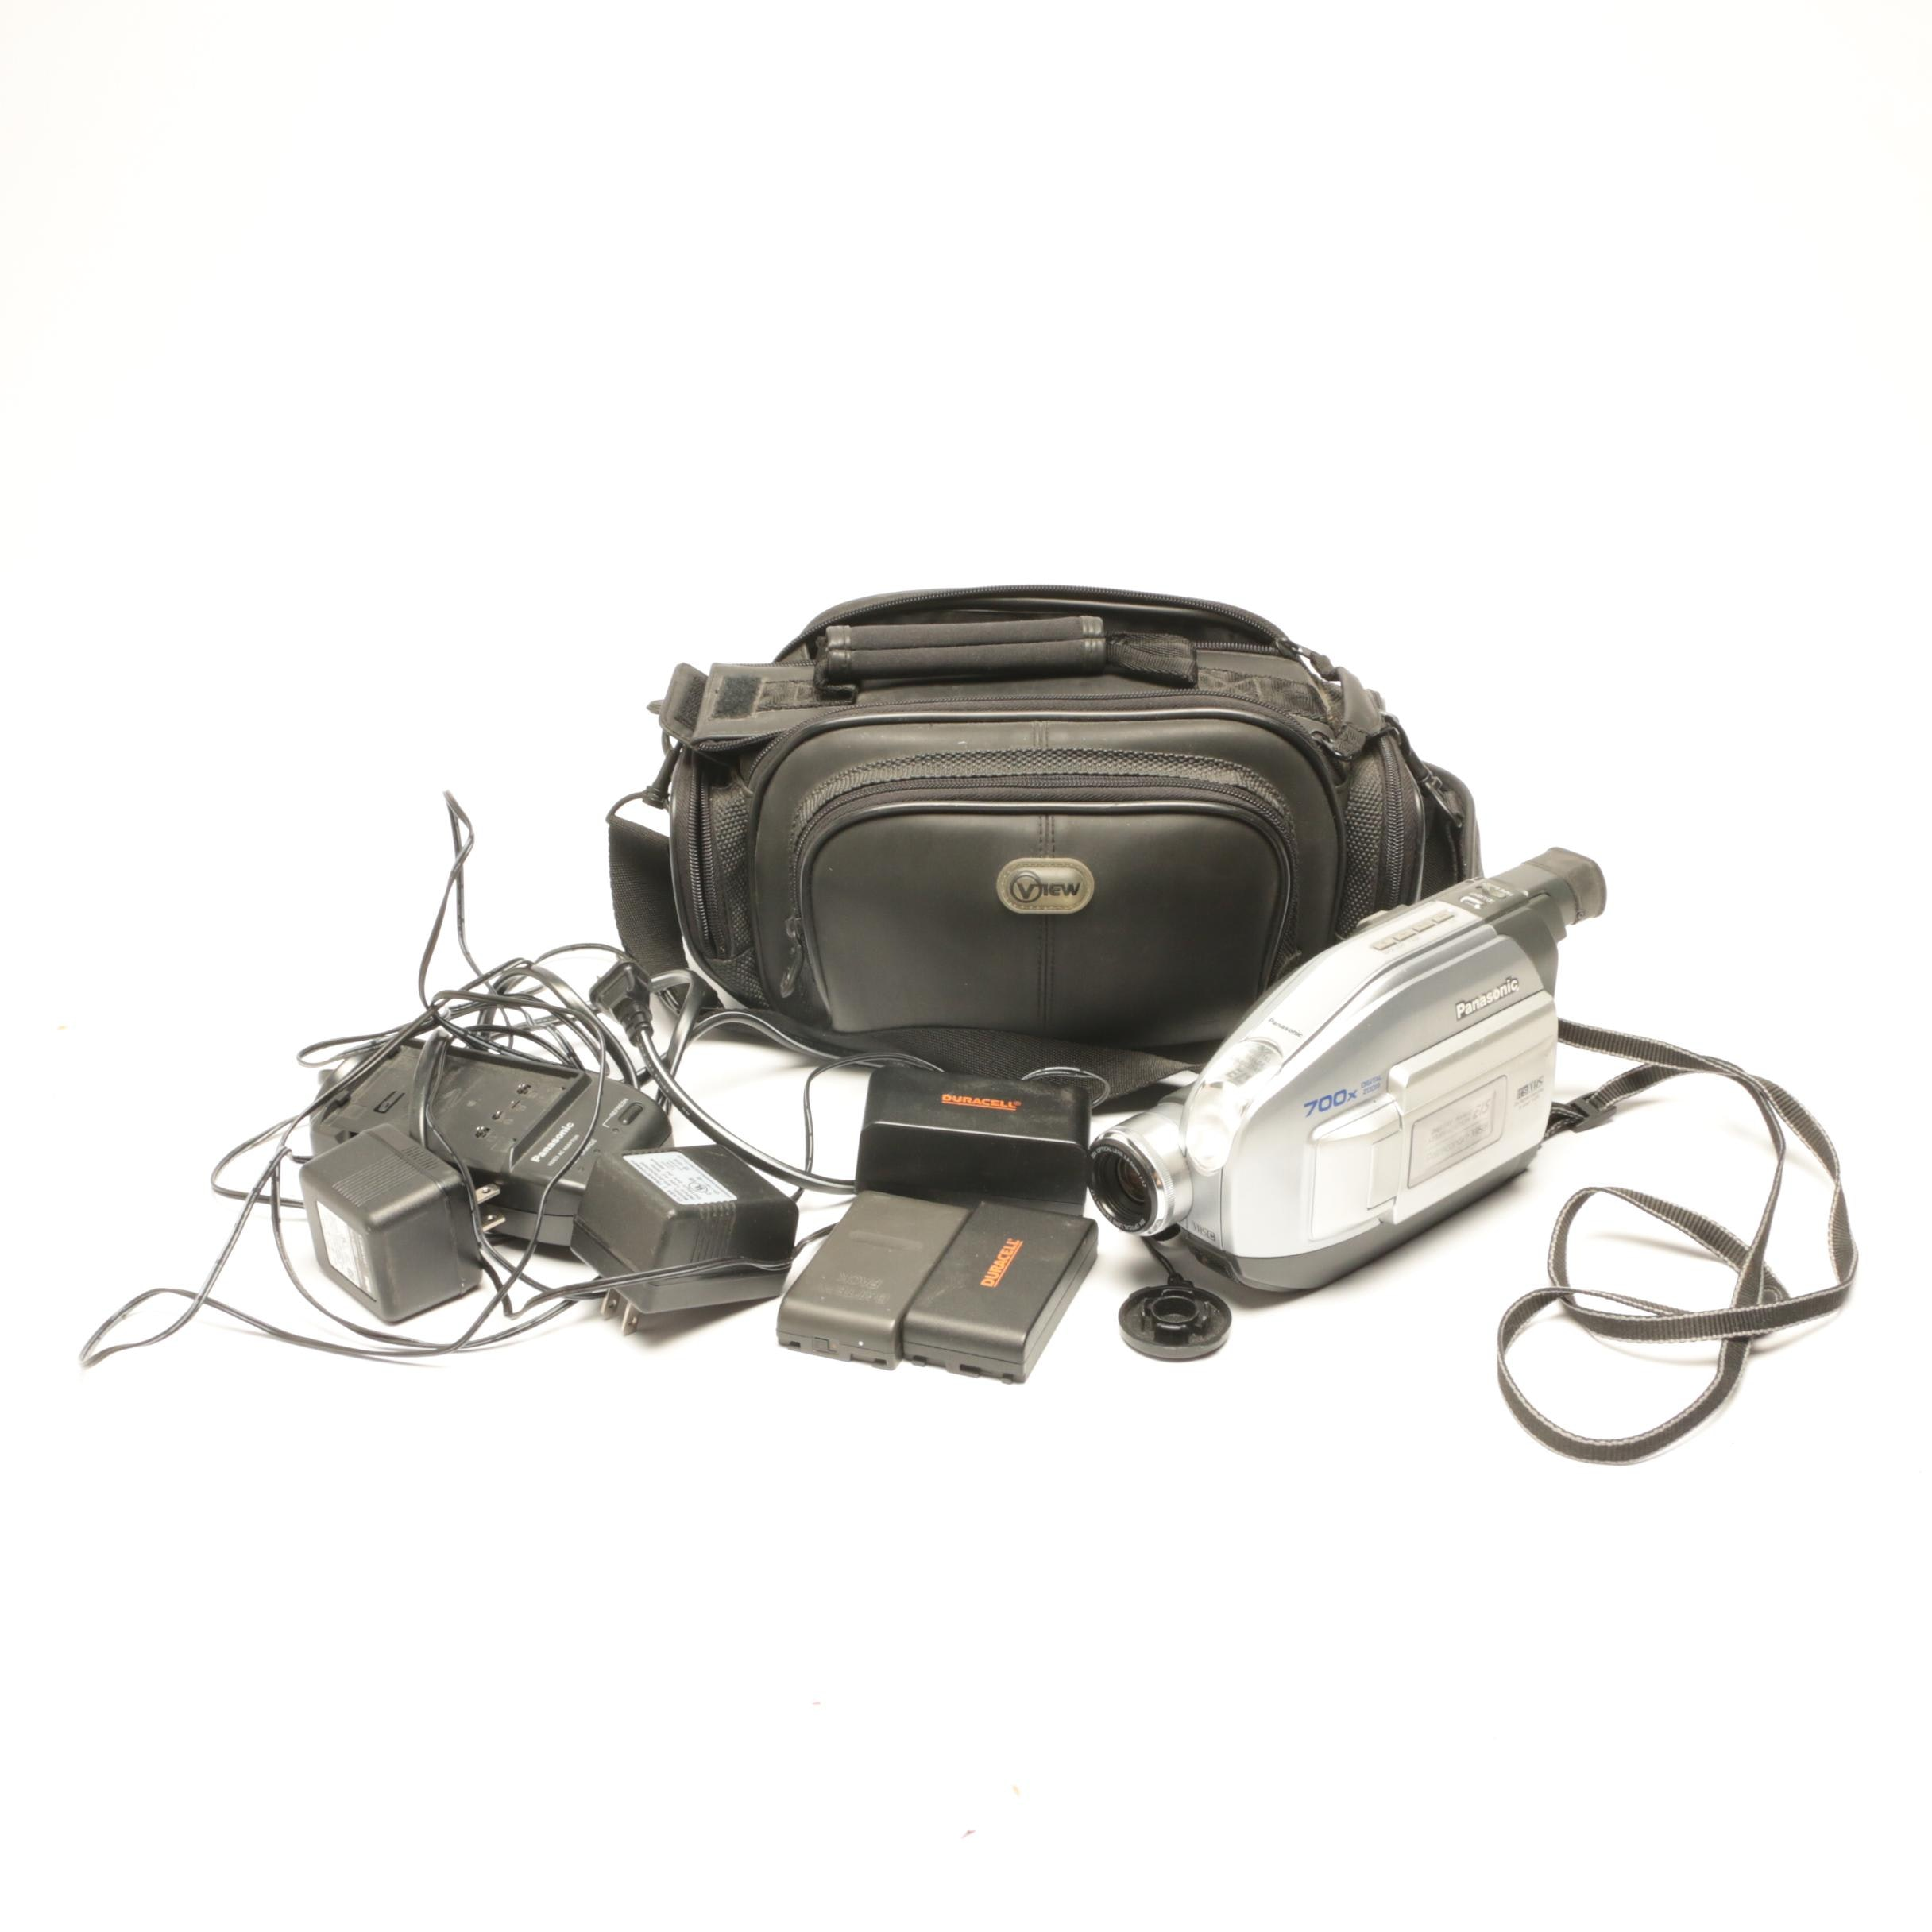 Panasonic Digital Zoom Palmcorder